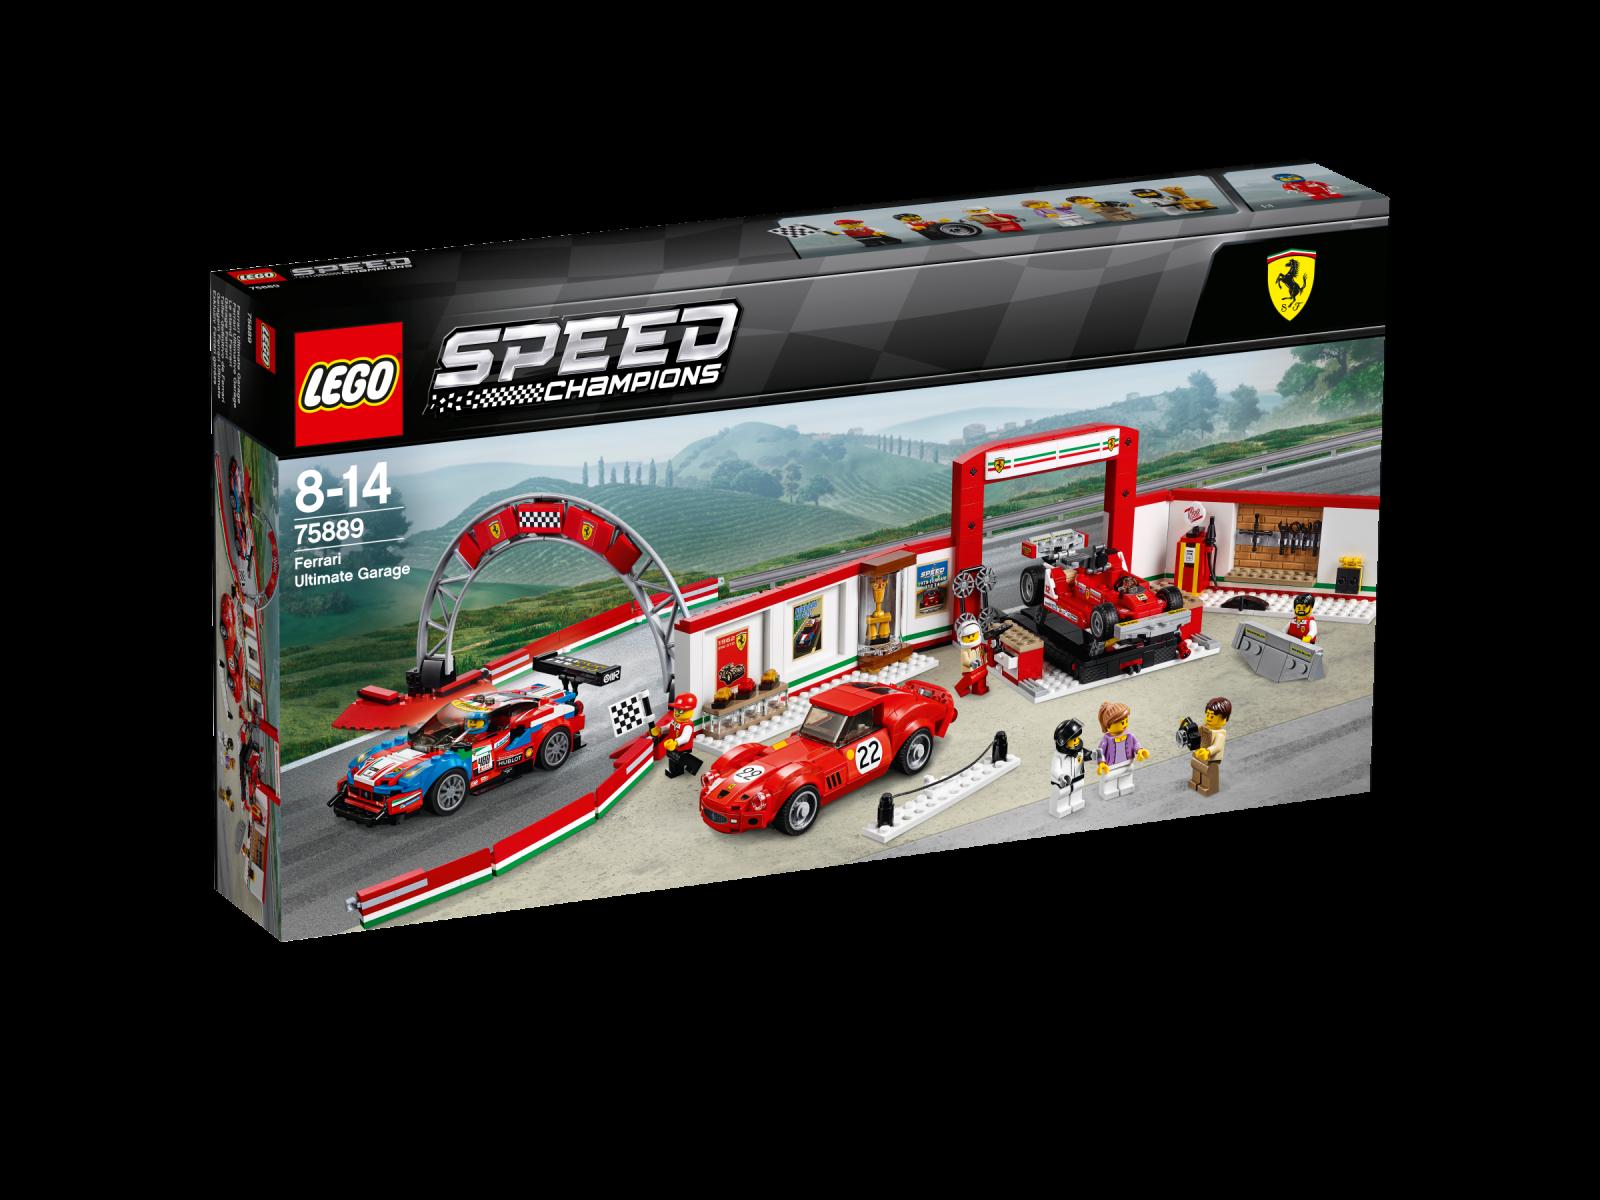 LEGO® Speed Champions Champions Champions 75889 Ferrari Ultimative Garage NEU OVP_ NEW MISB NRFB b1cab4